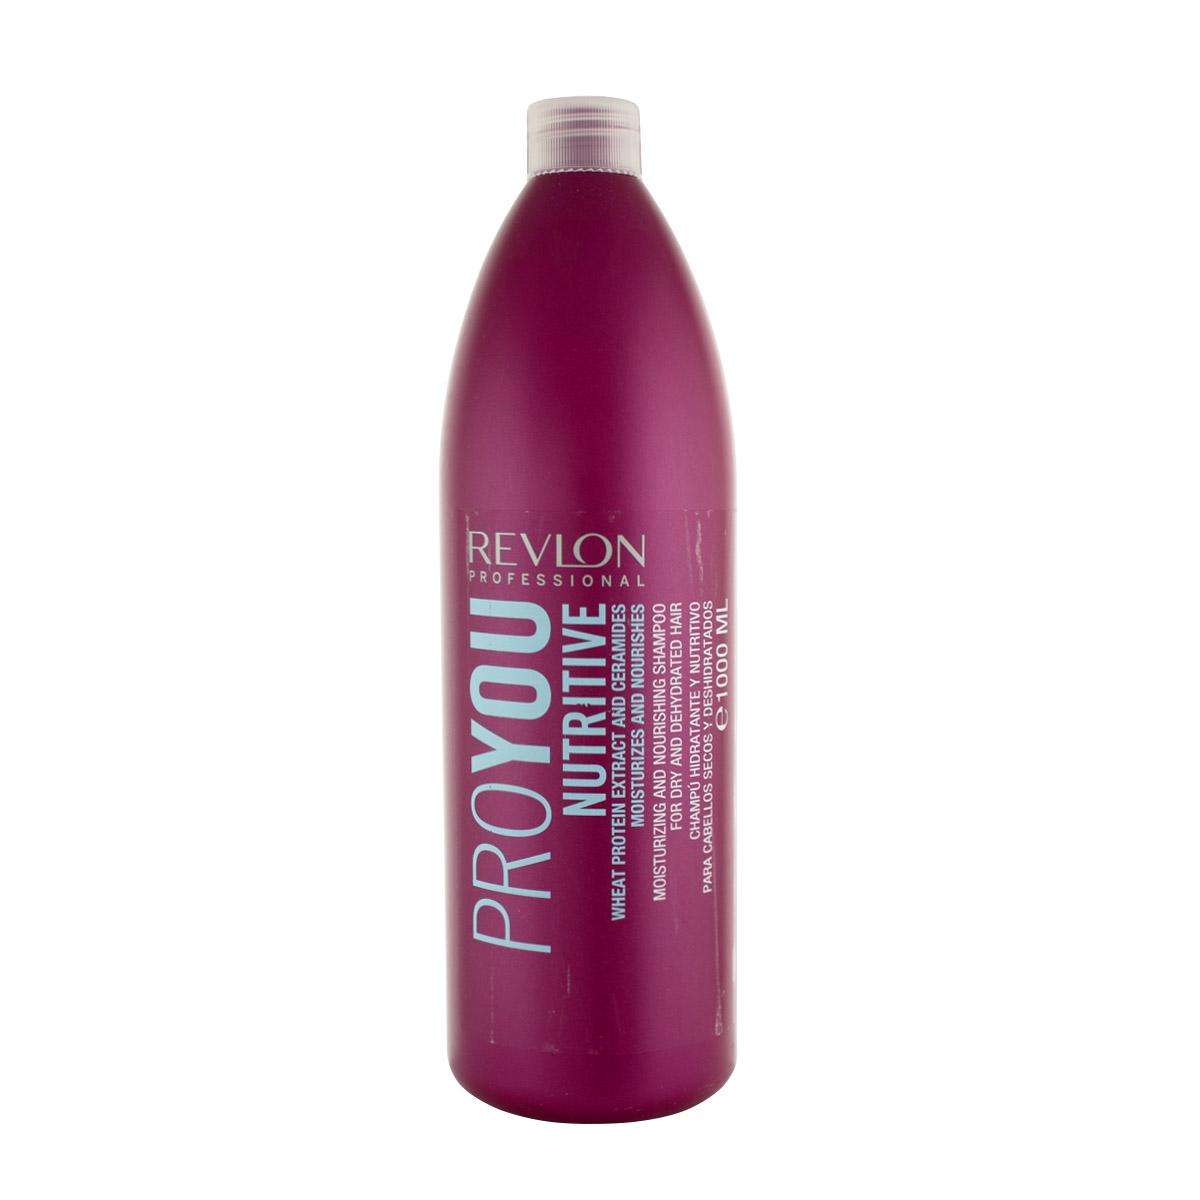 Revlon Professional Pro You Hydro-Nutritive Shampoo 1000 ml